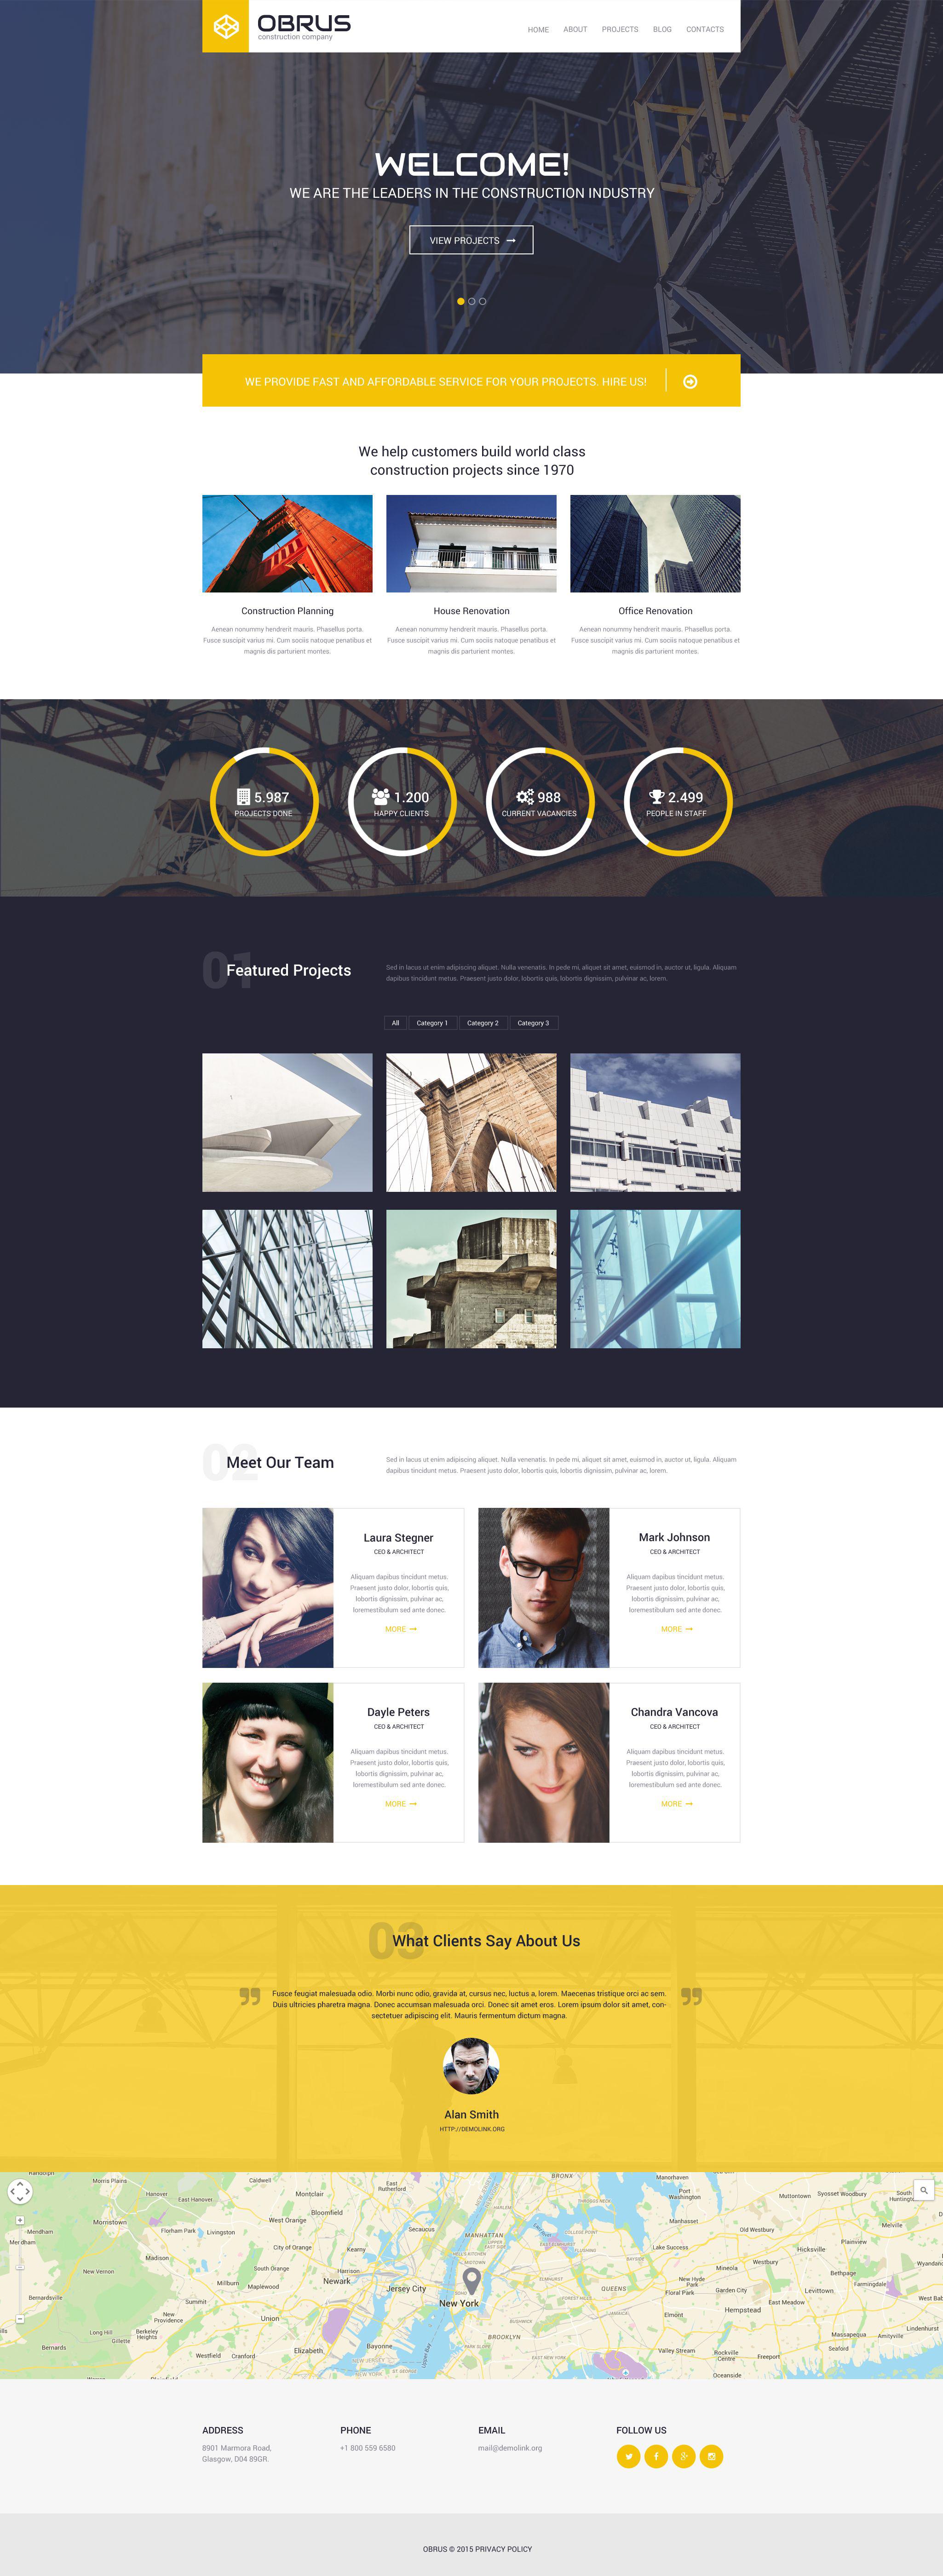 Obrus PSD Template - screenshot